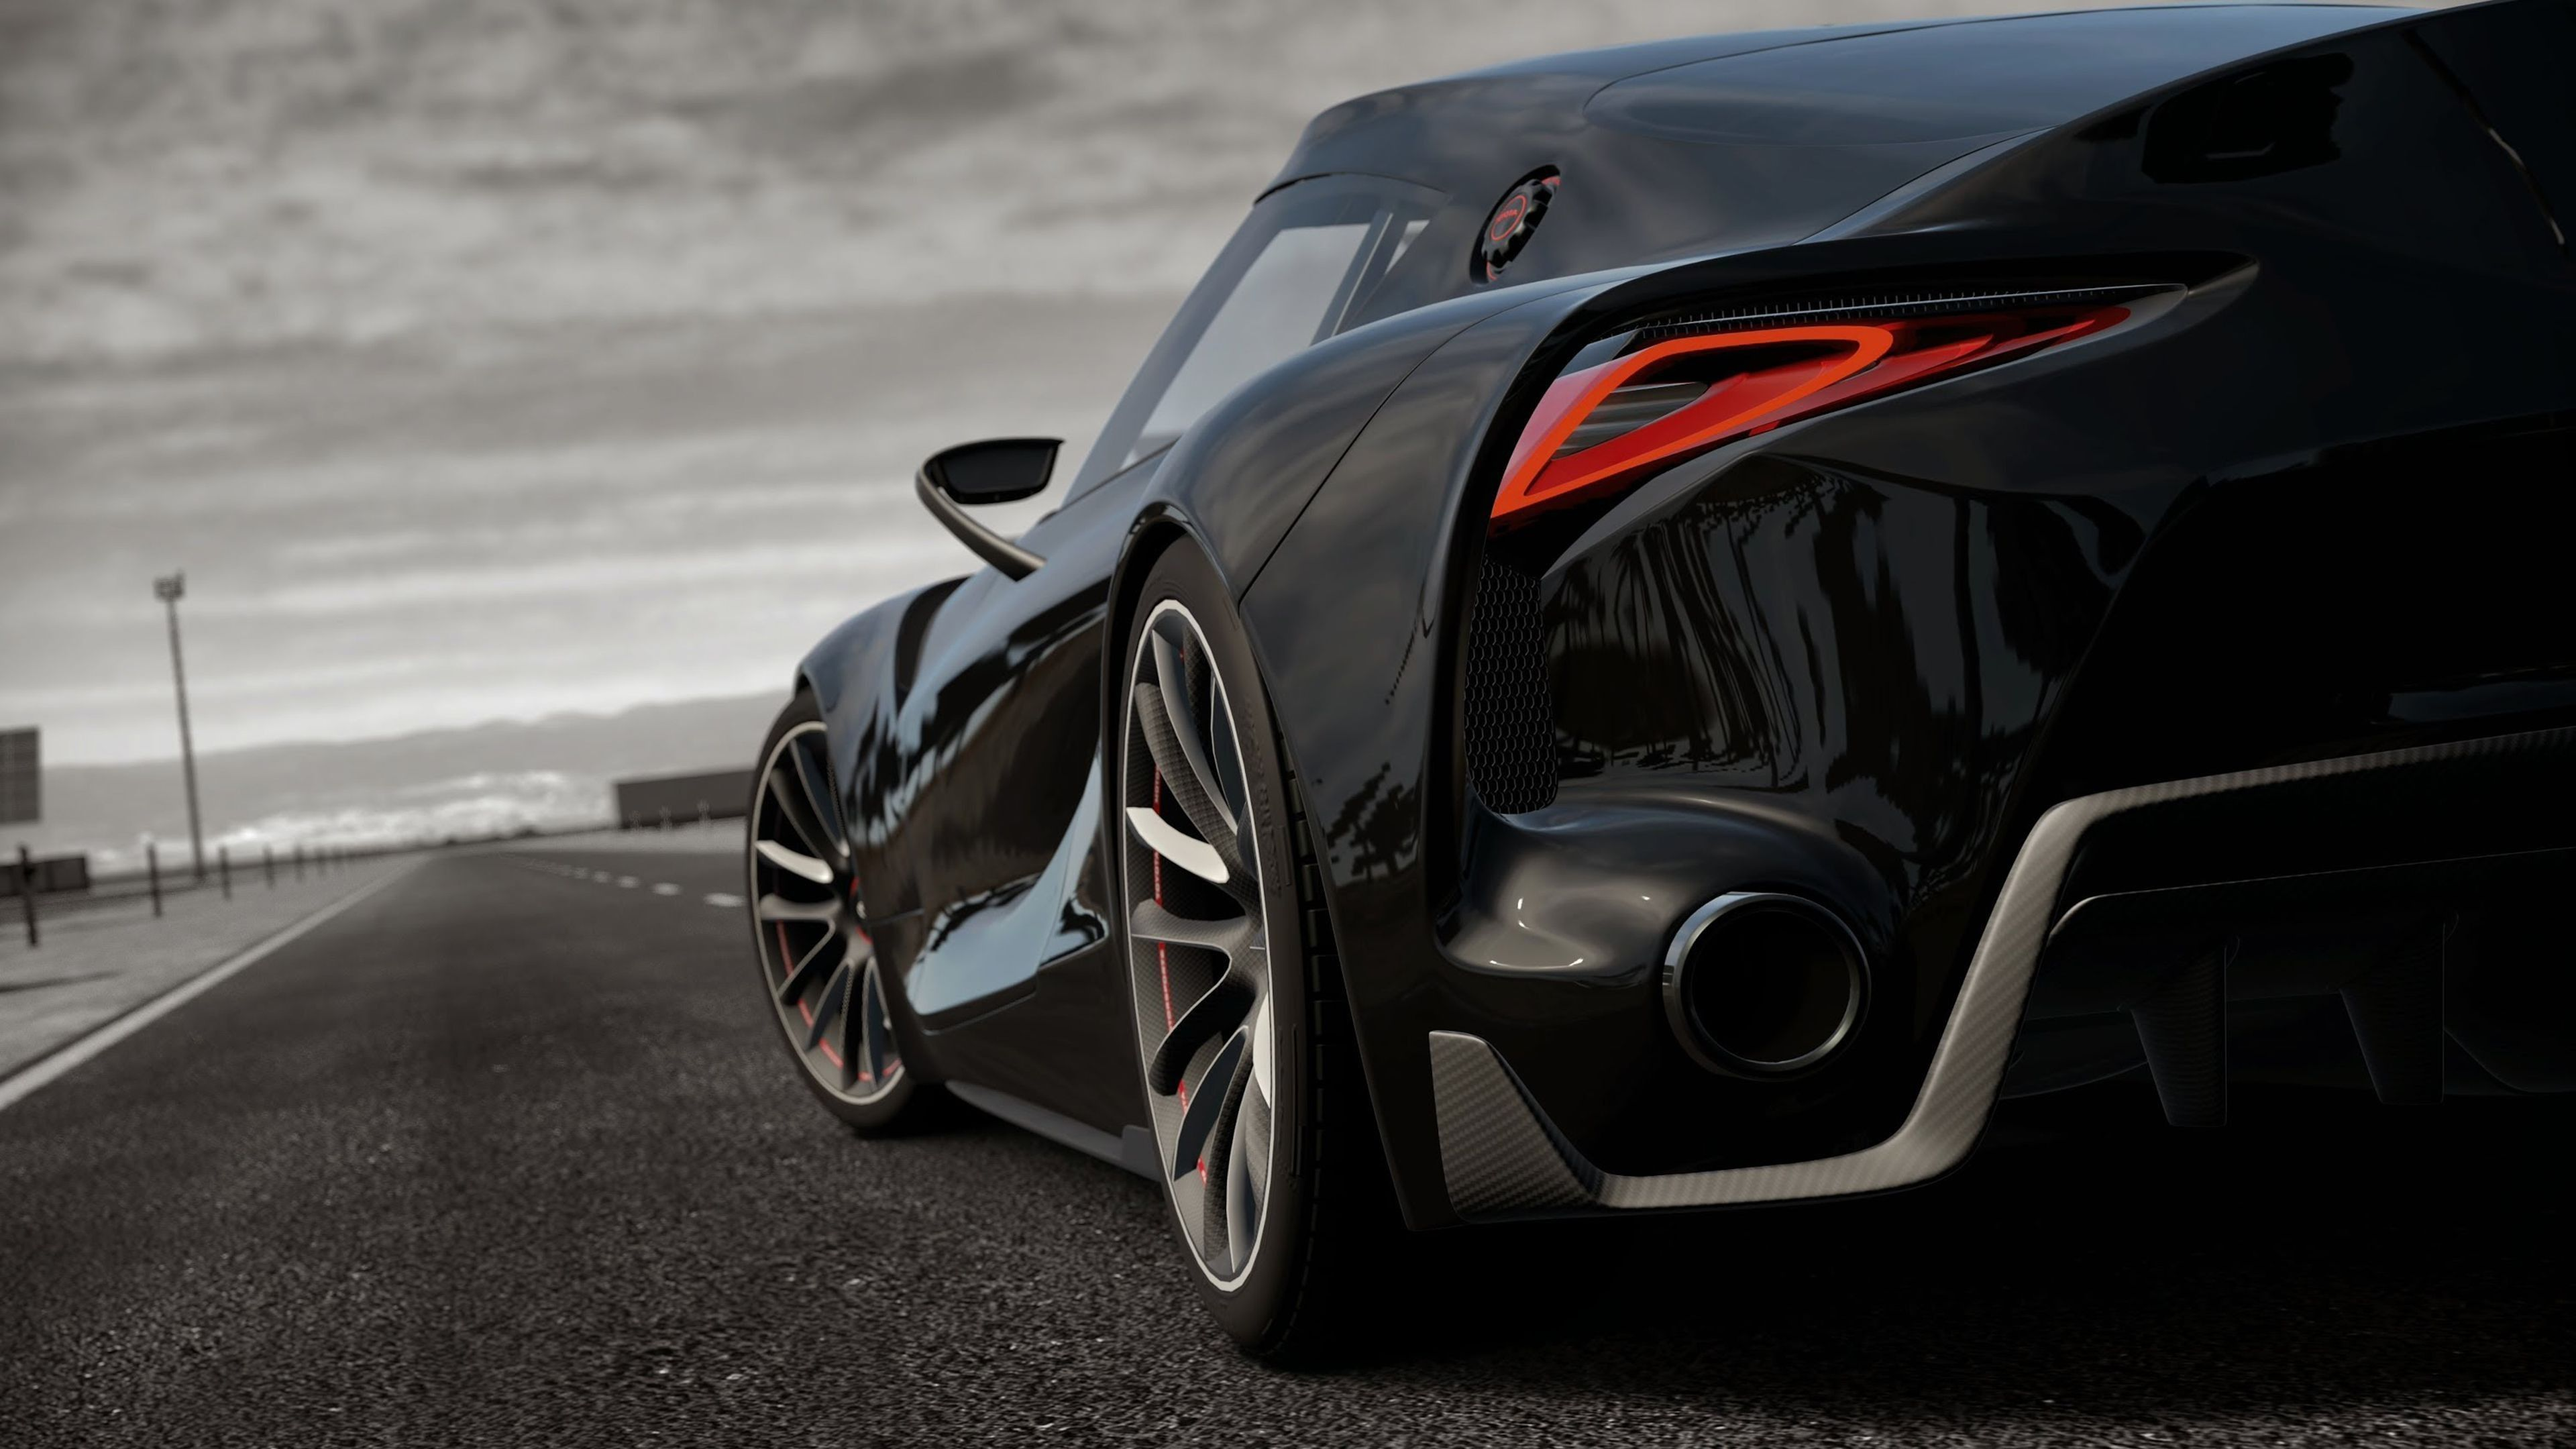 Best 4k Car Wallpapers Top Free Best 4k Car Backgrounds Wallpaperaccess